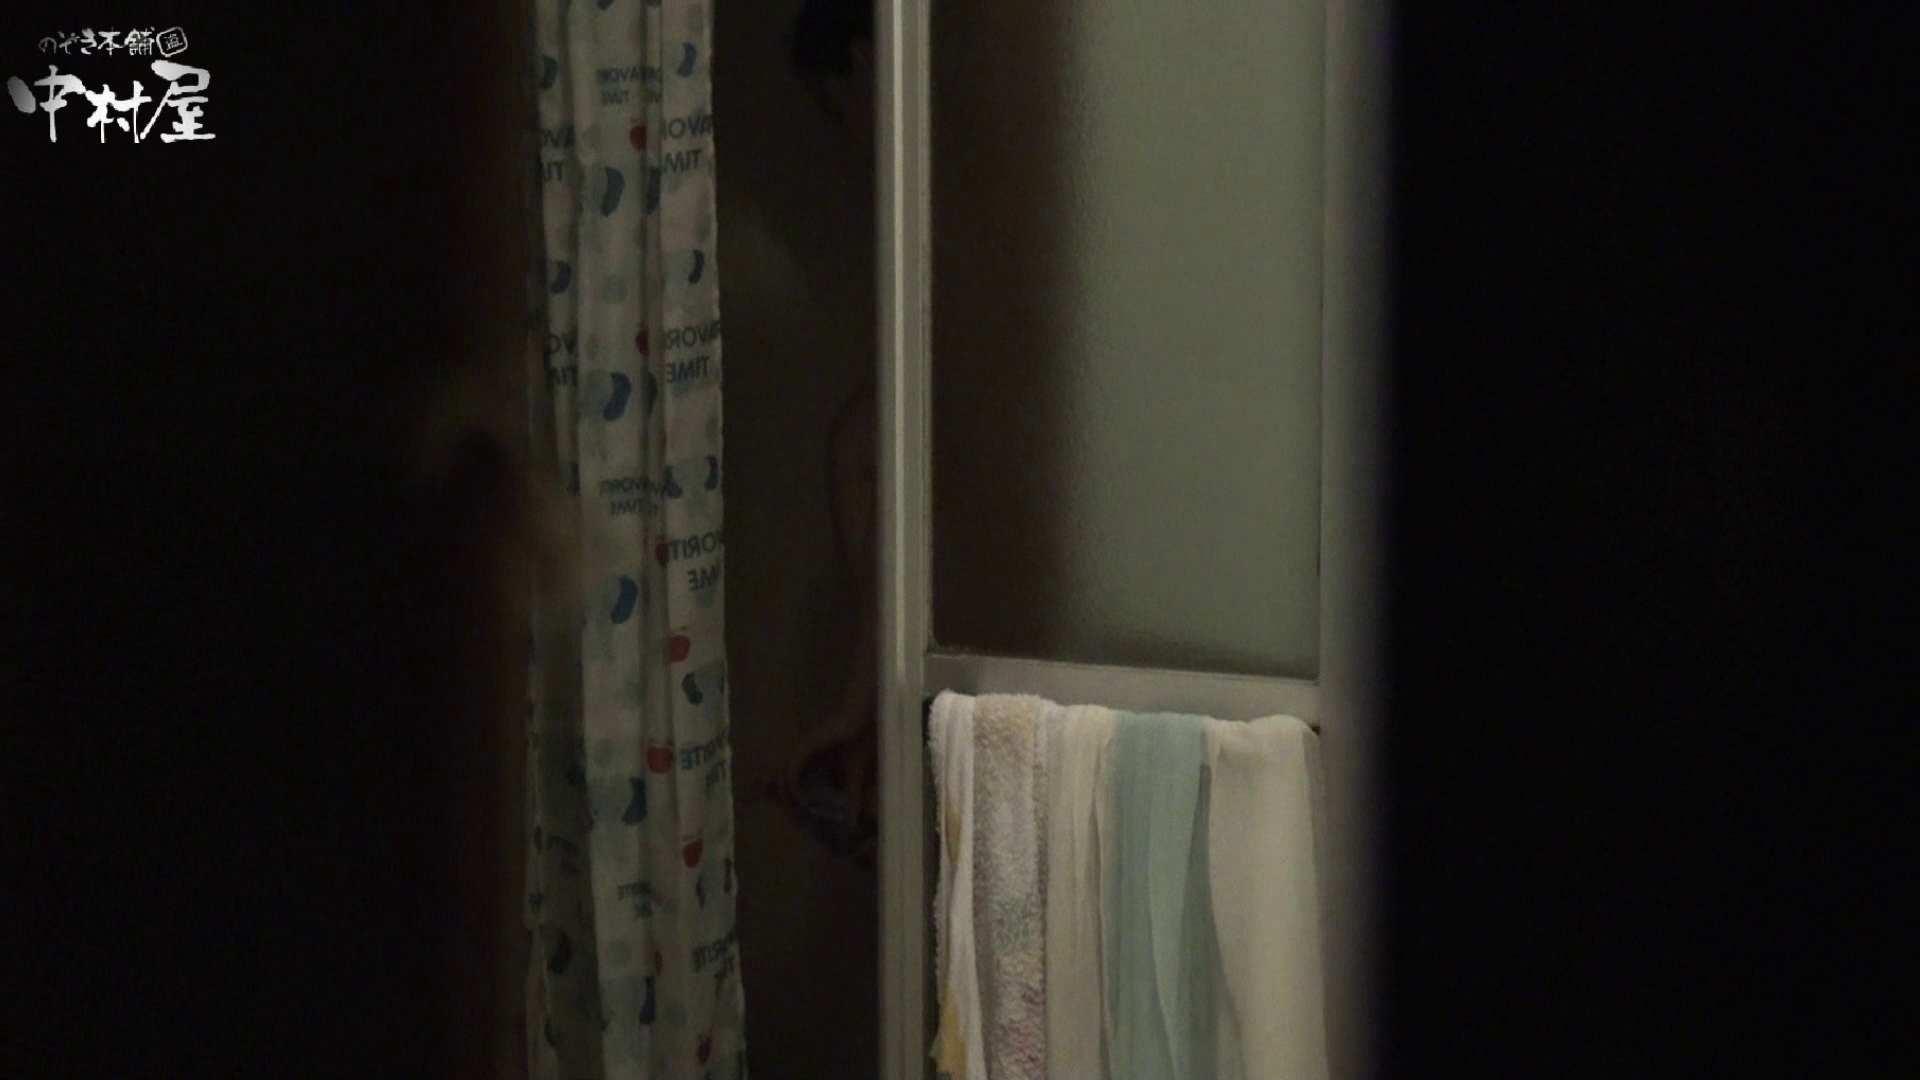 民家風呂専門盗撮師の超危険映像 vol.029 股間 | OLのエロ生活  26連発 25